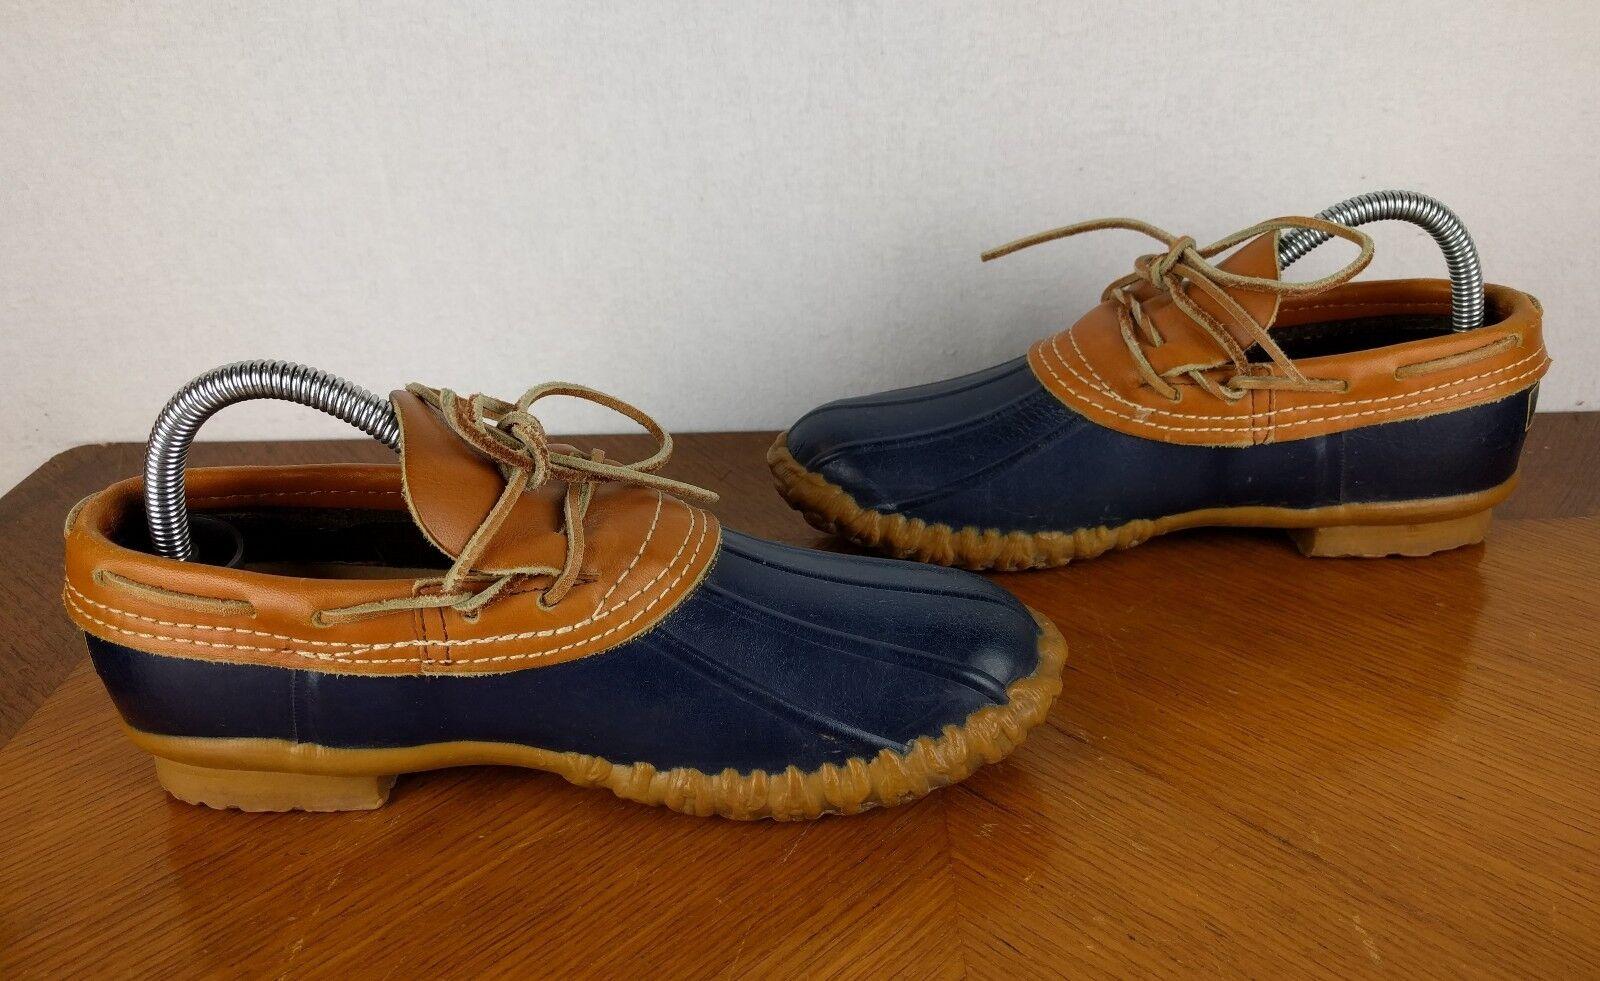 VTG VTG VTG LL Bean Maine Hunting stivali blu Sz 8 USA Duck Rubber Leather Ankle scarpe 8e4f44